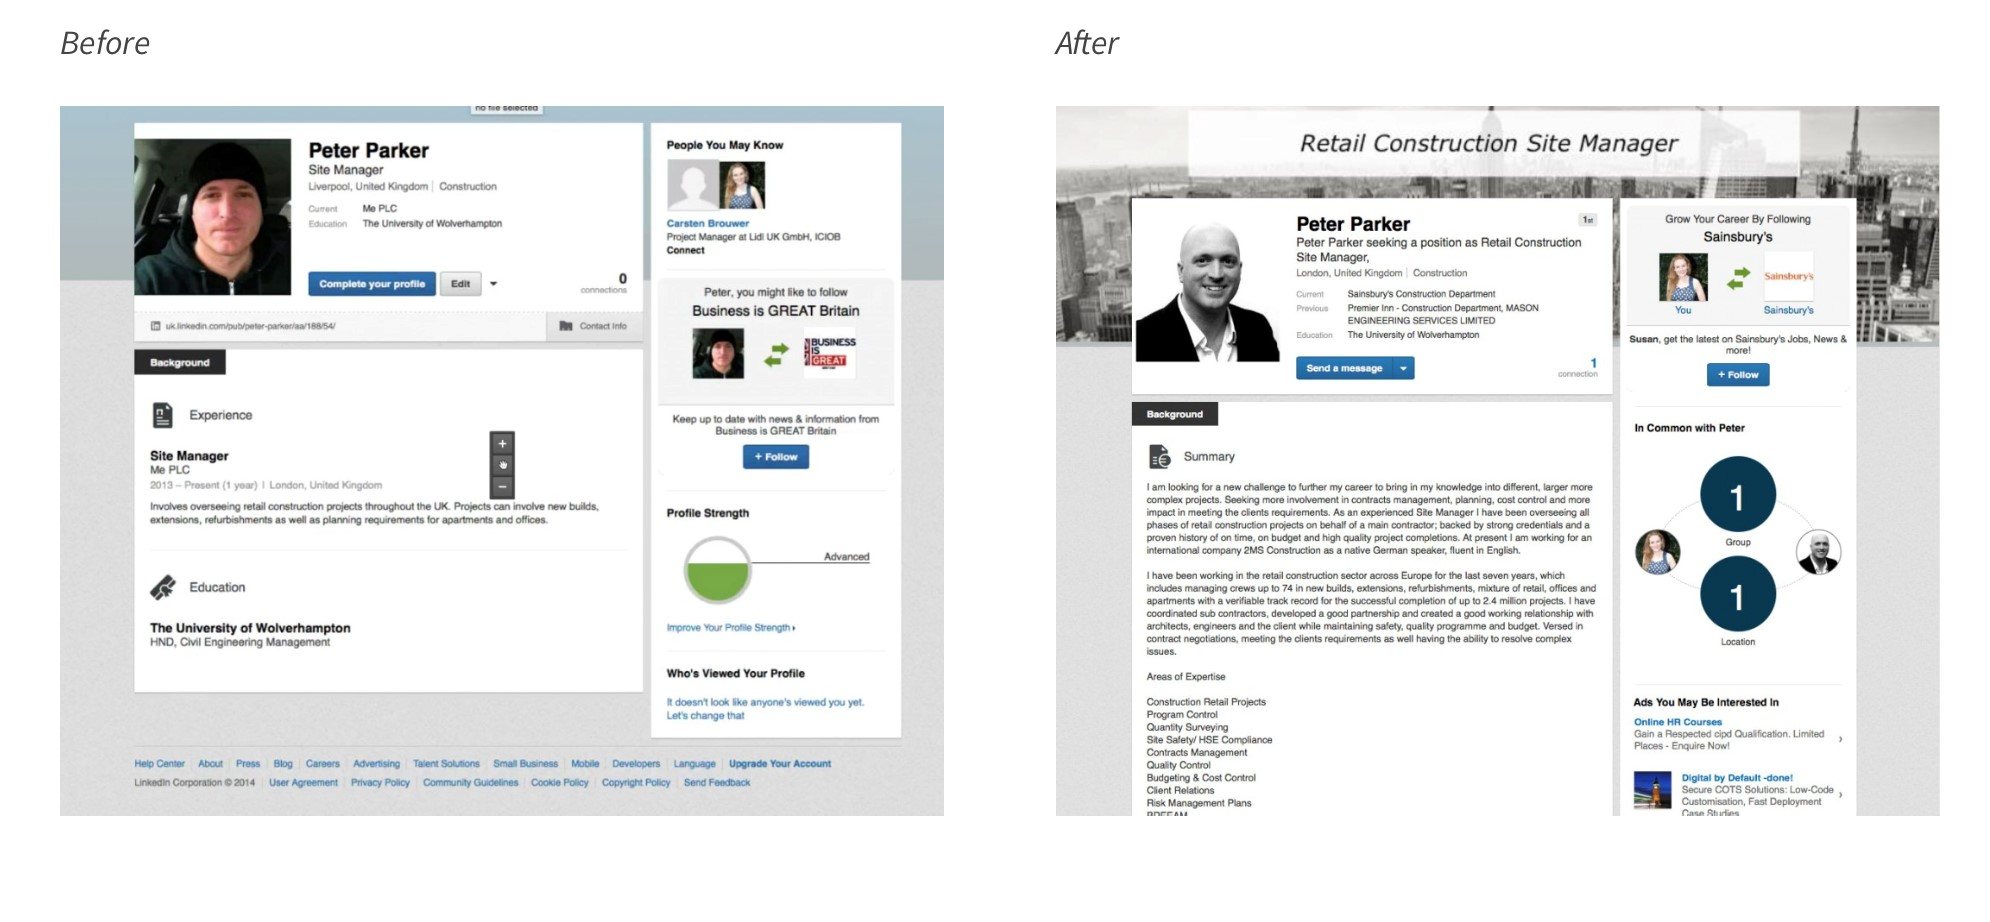 LinkedIn Profile: Before & After